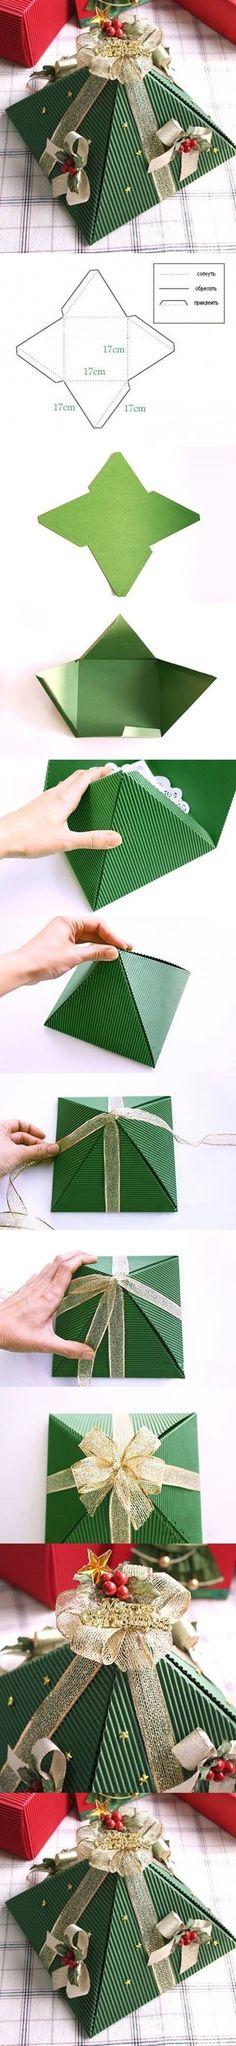 DIY Pyramid Christmas Gift Boxes